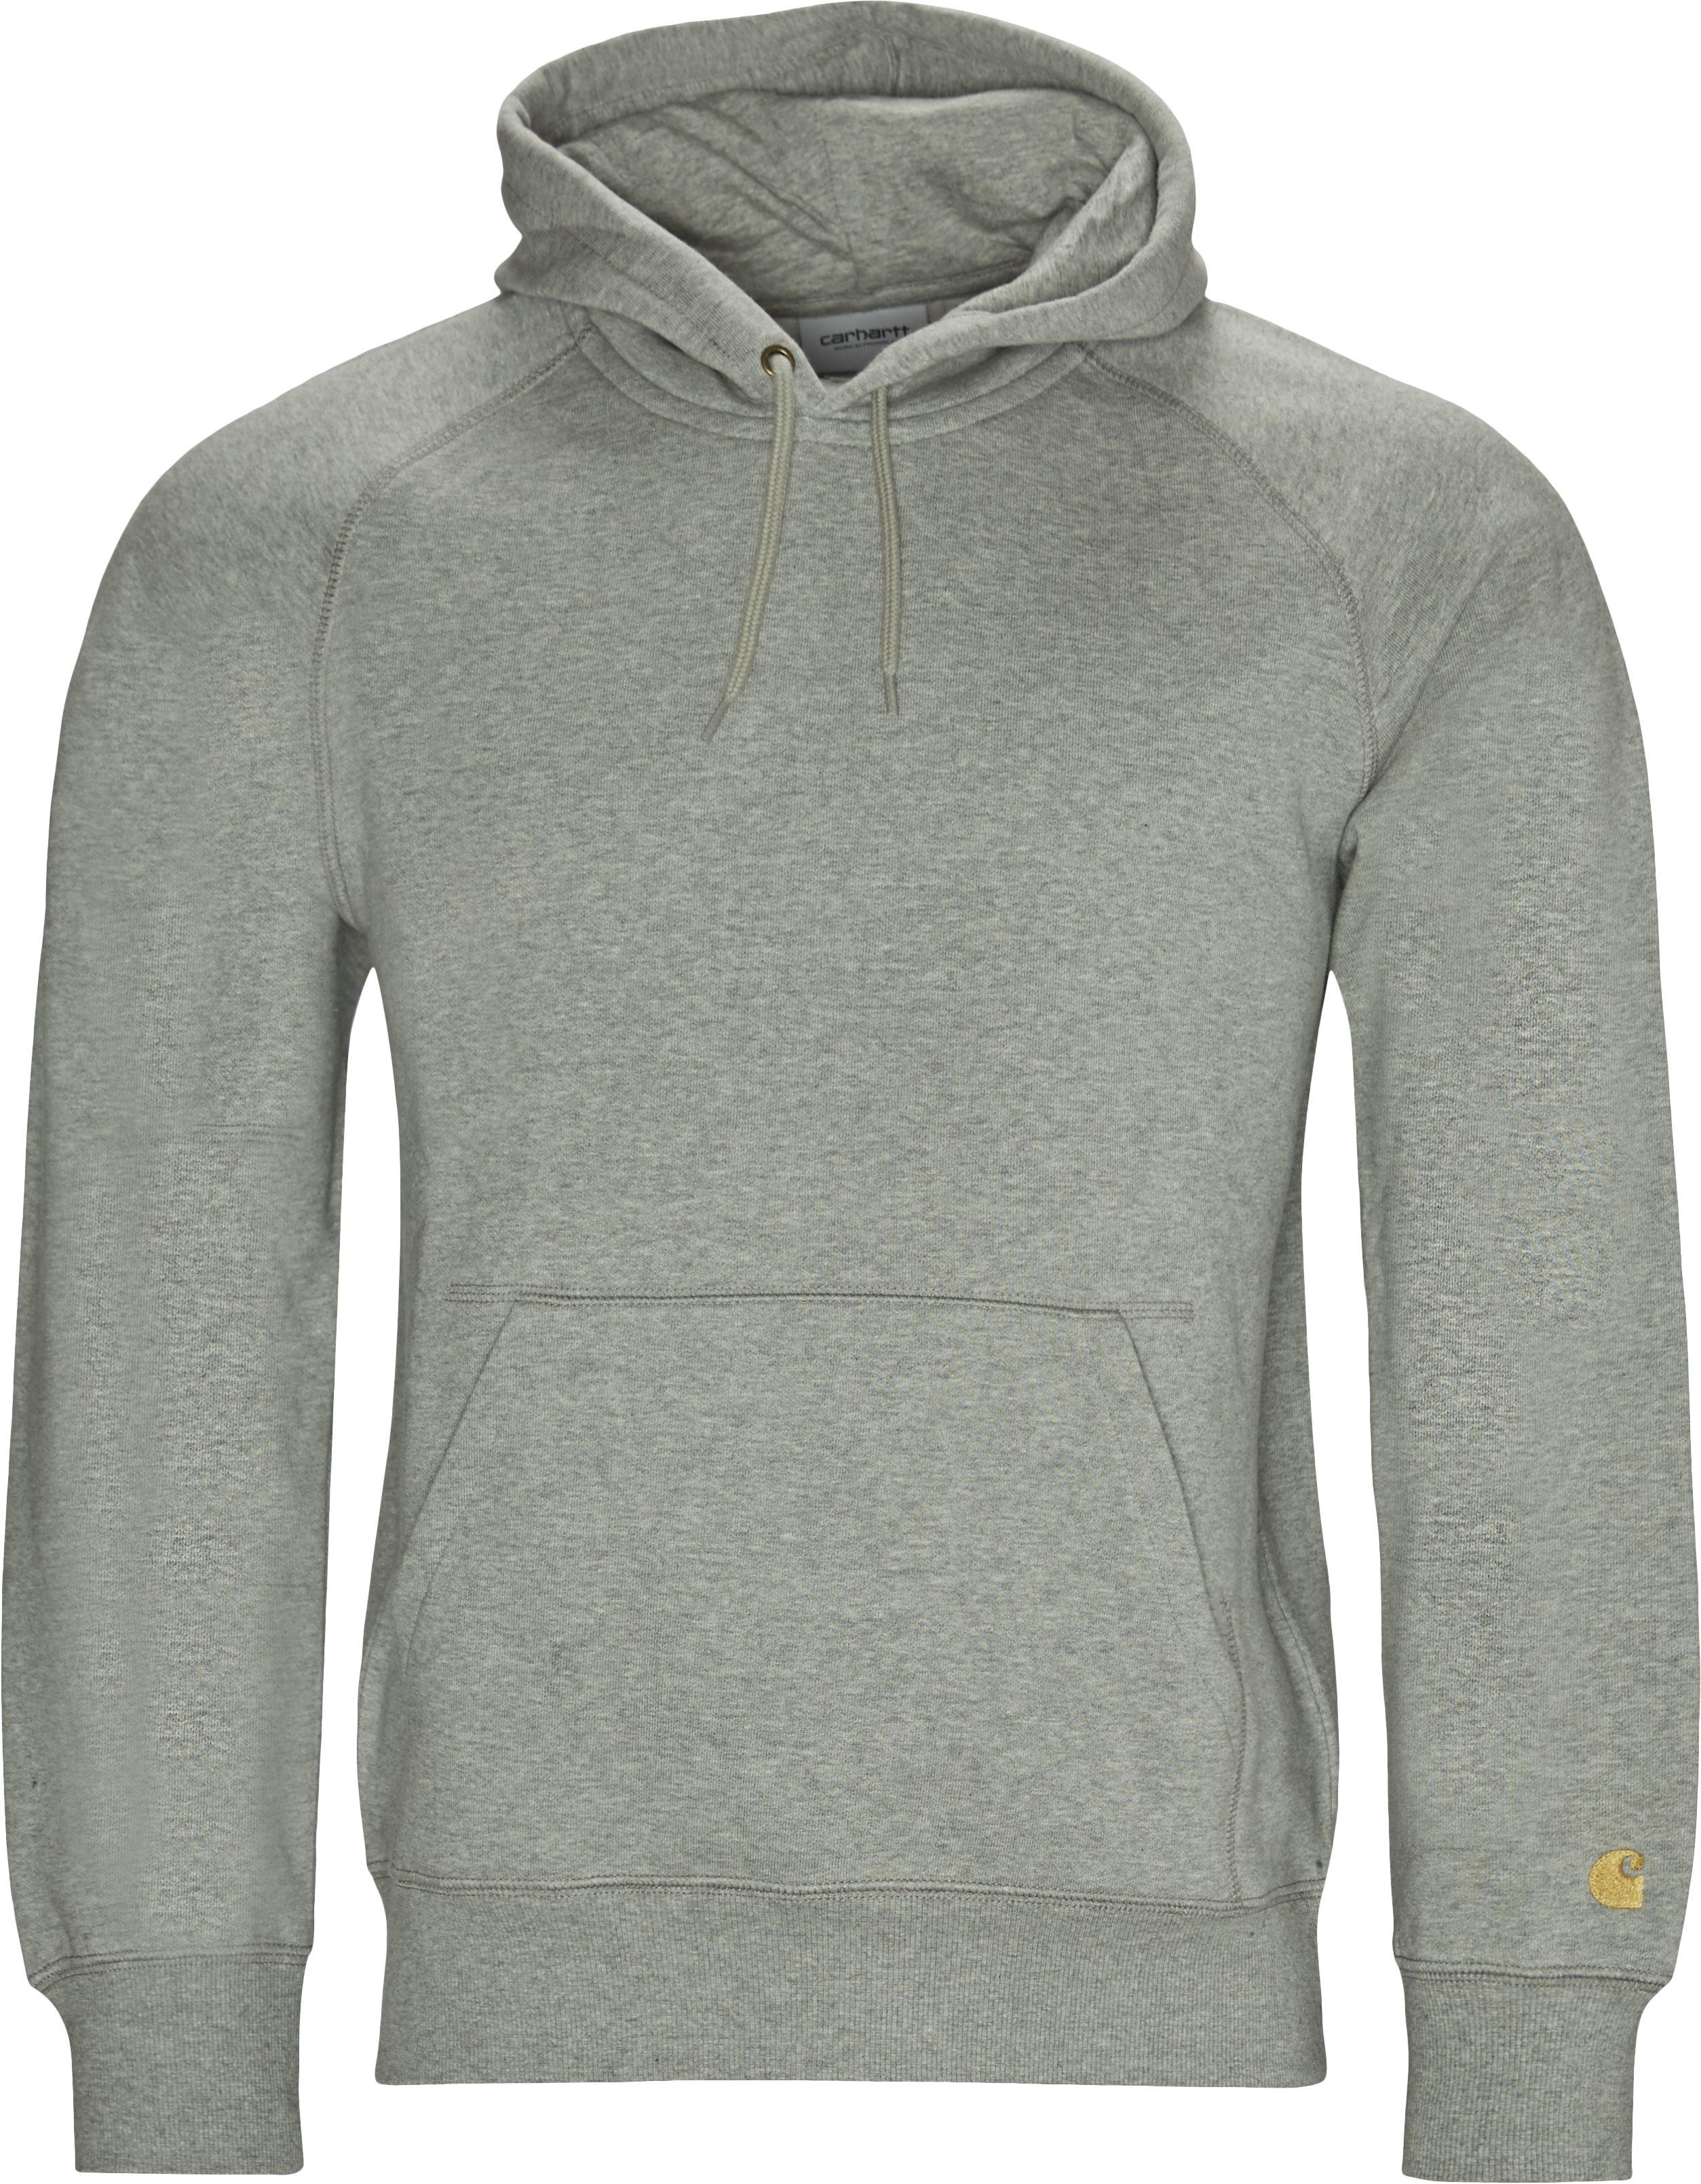 Hooded Chase Sweatshirt - Sweatshirts - Regular - Grå